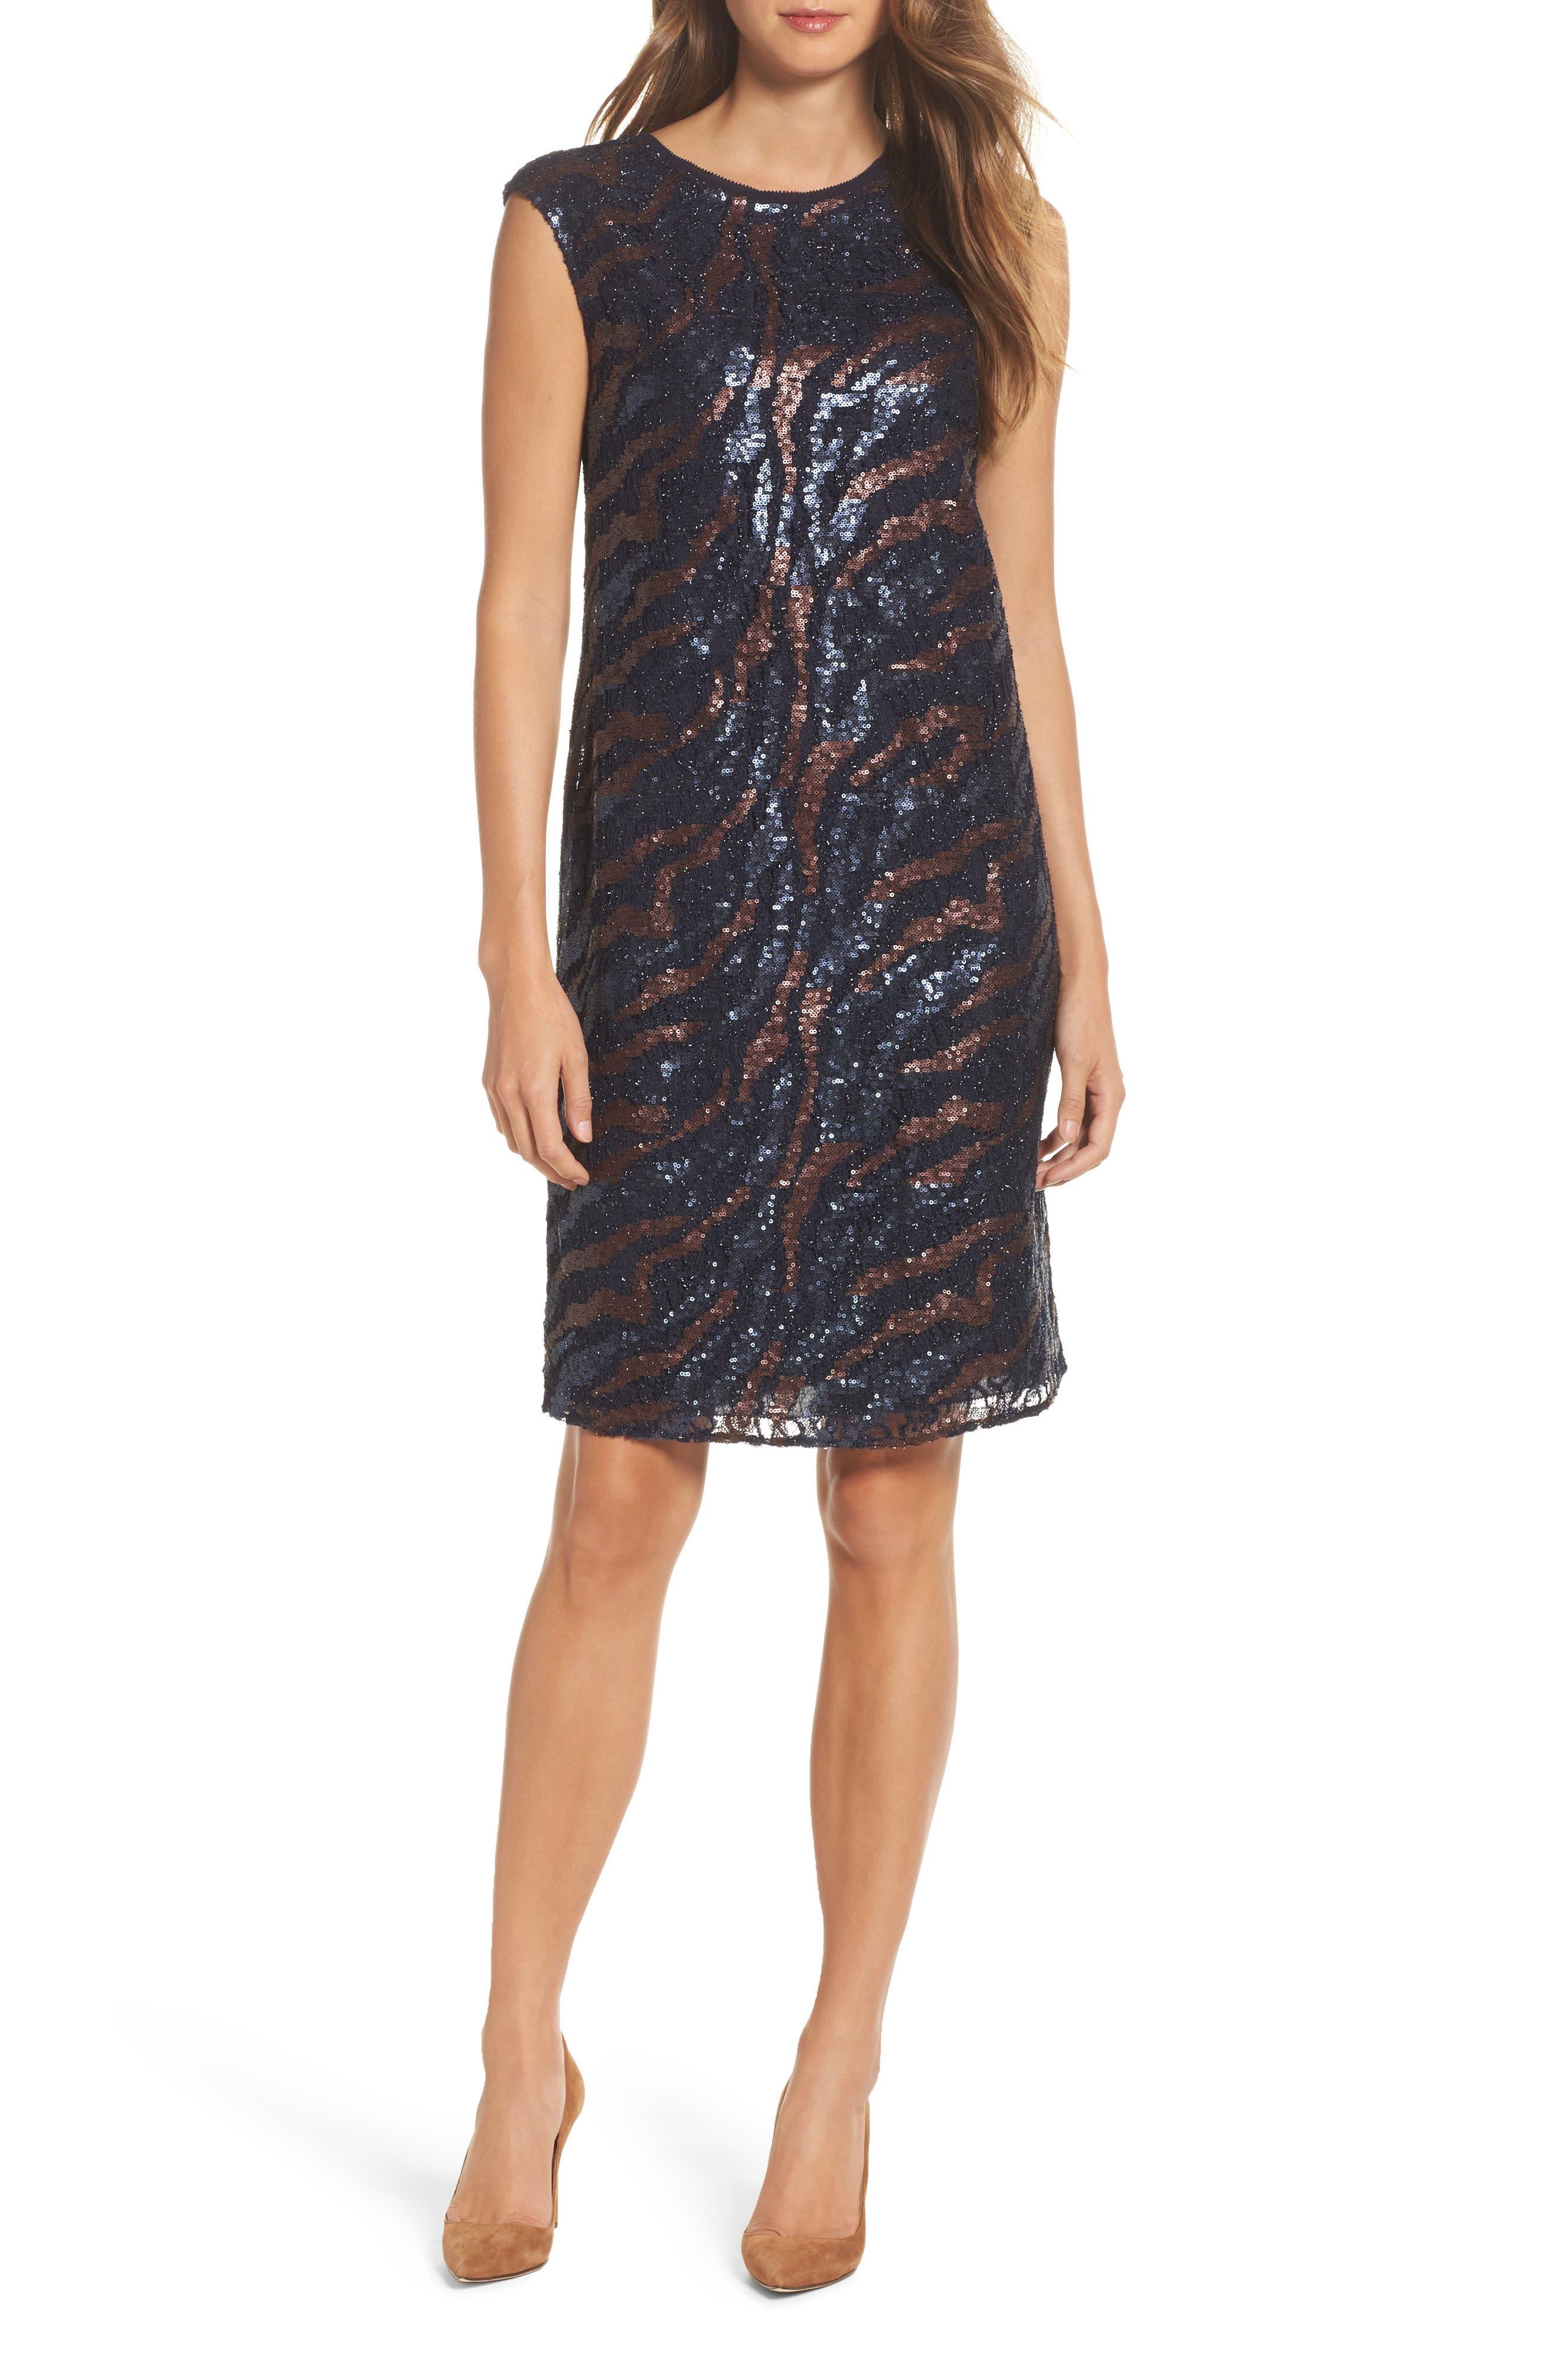 NIC + Zoe Sequin Lace Shift Dress,                             Main thumbnail 1, color,                             229